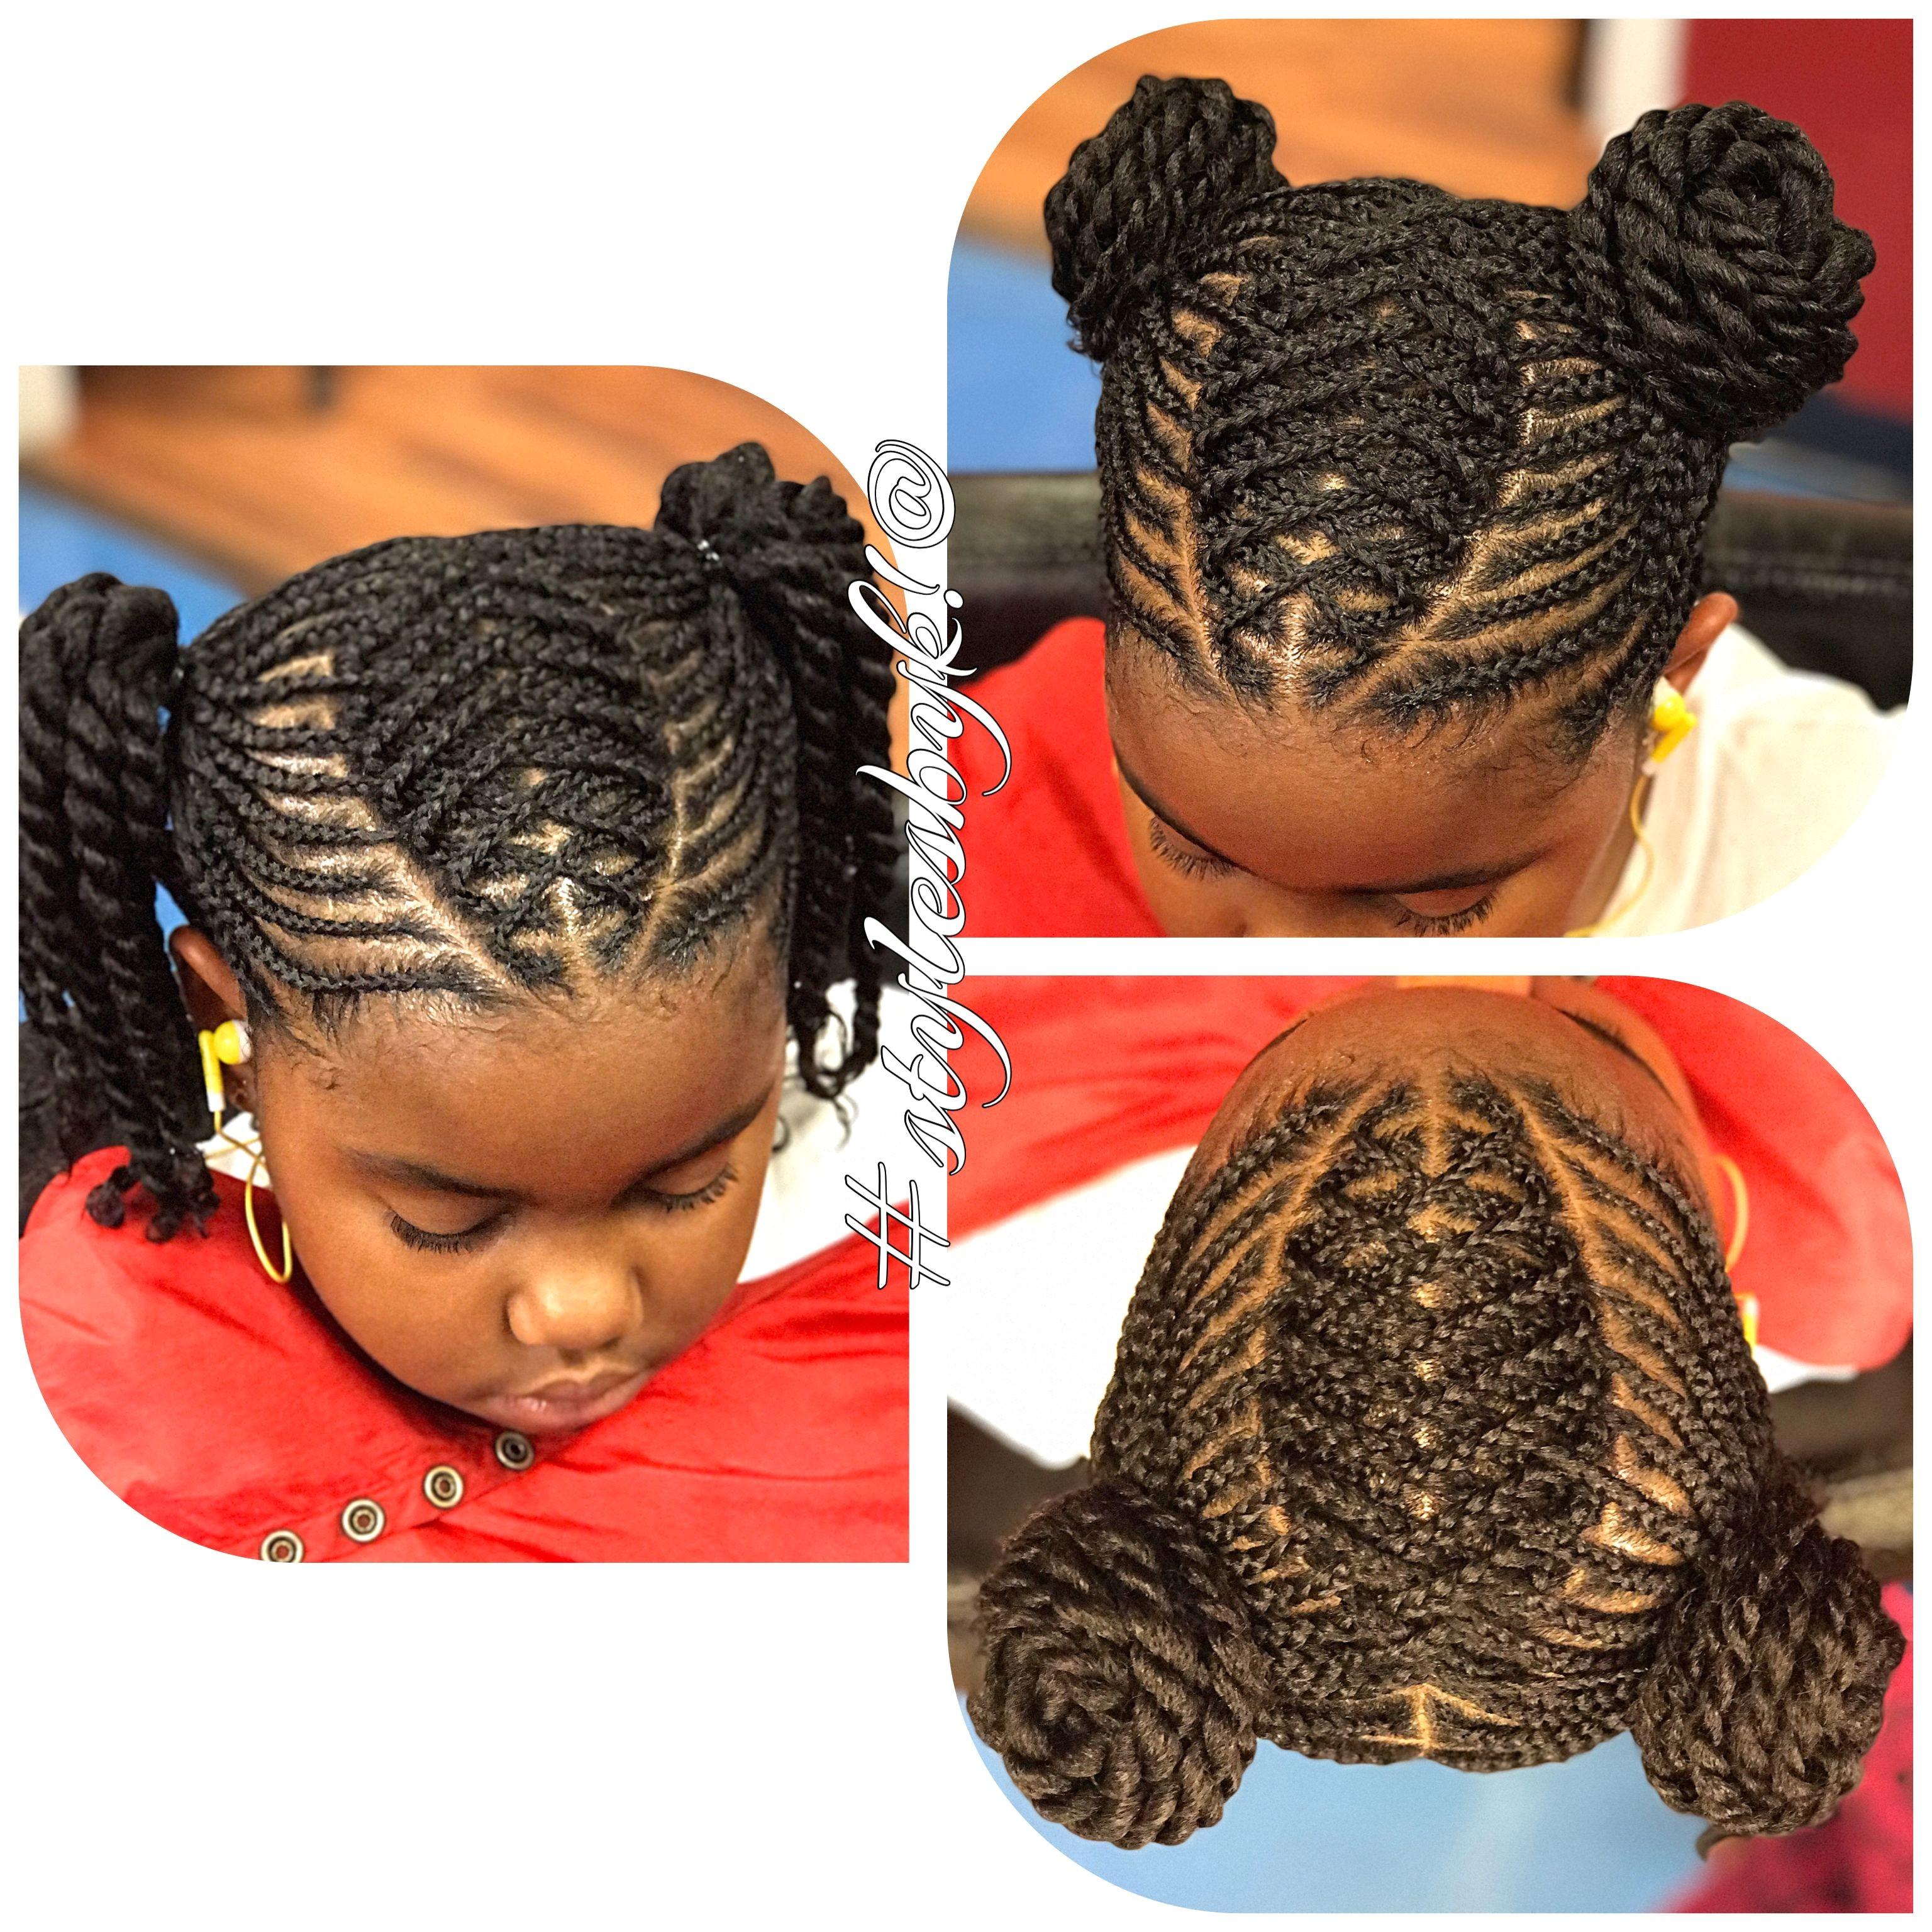 Best virtual hairstyle website a pixie cut hairstyle women haircuts pixie hairstyles for short hair afro hairstyles products boho hairstyles black haircuts